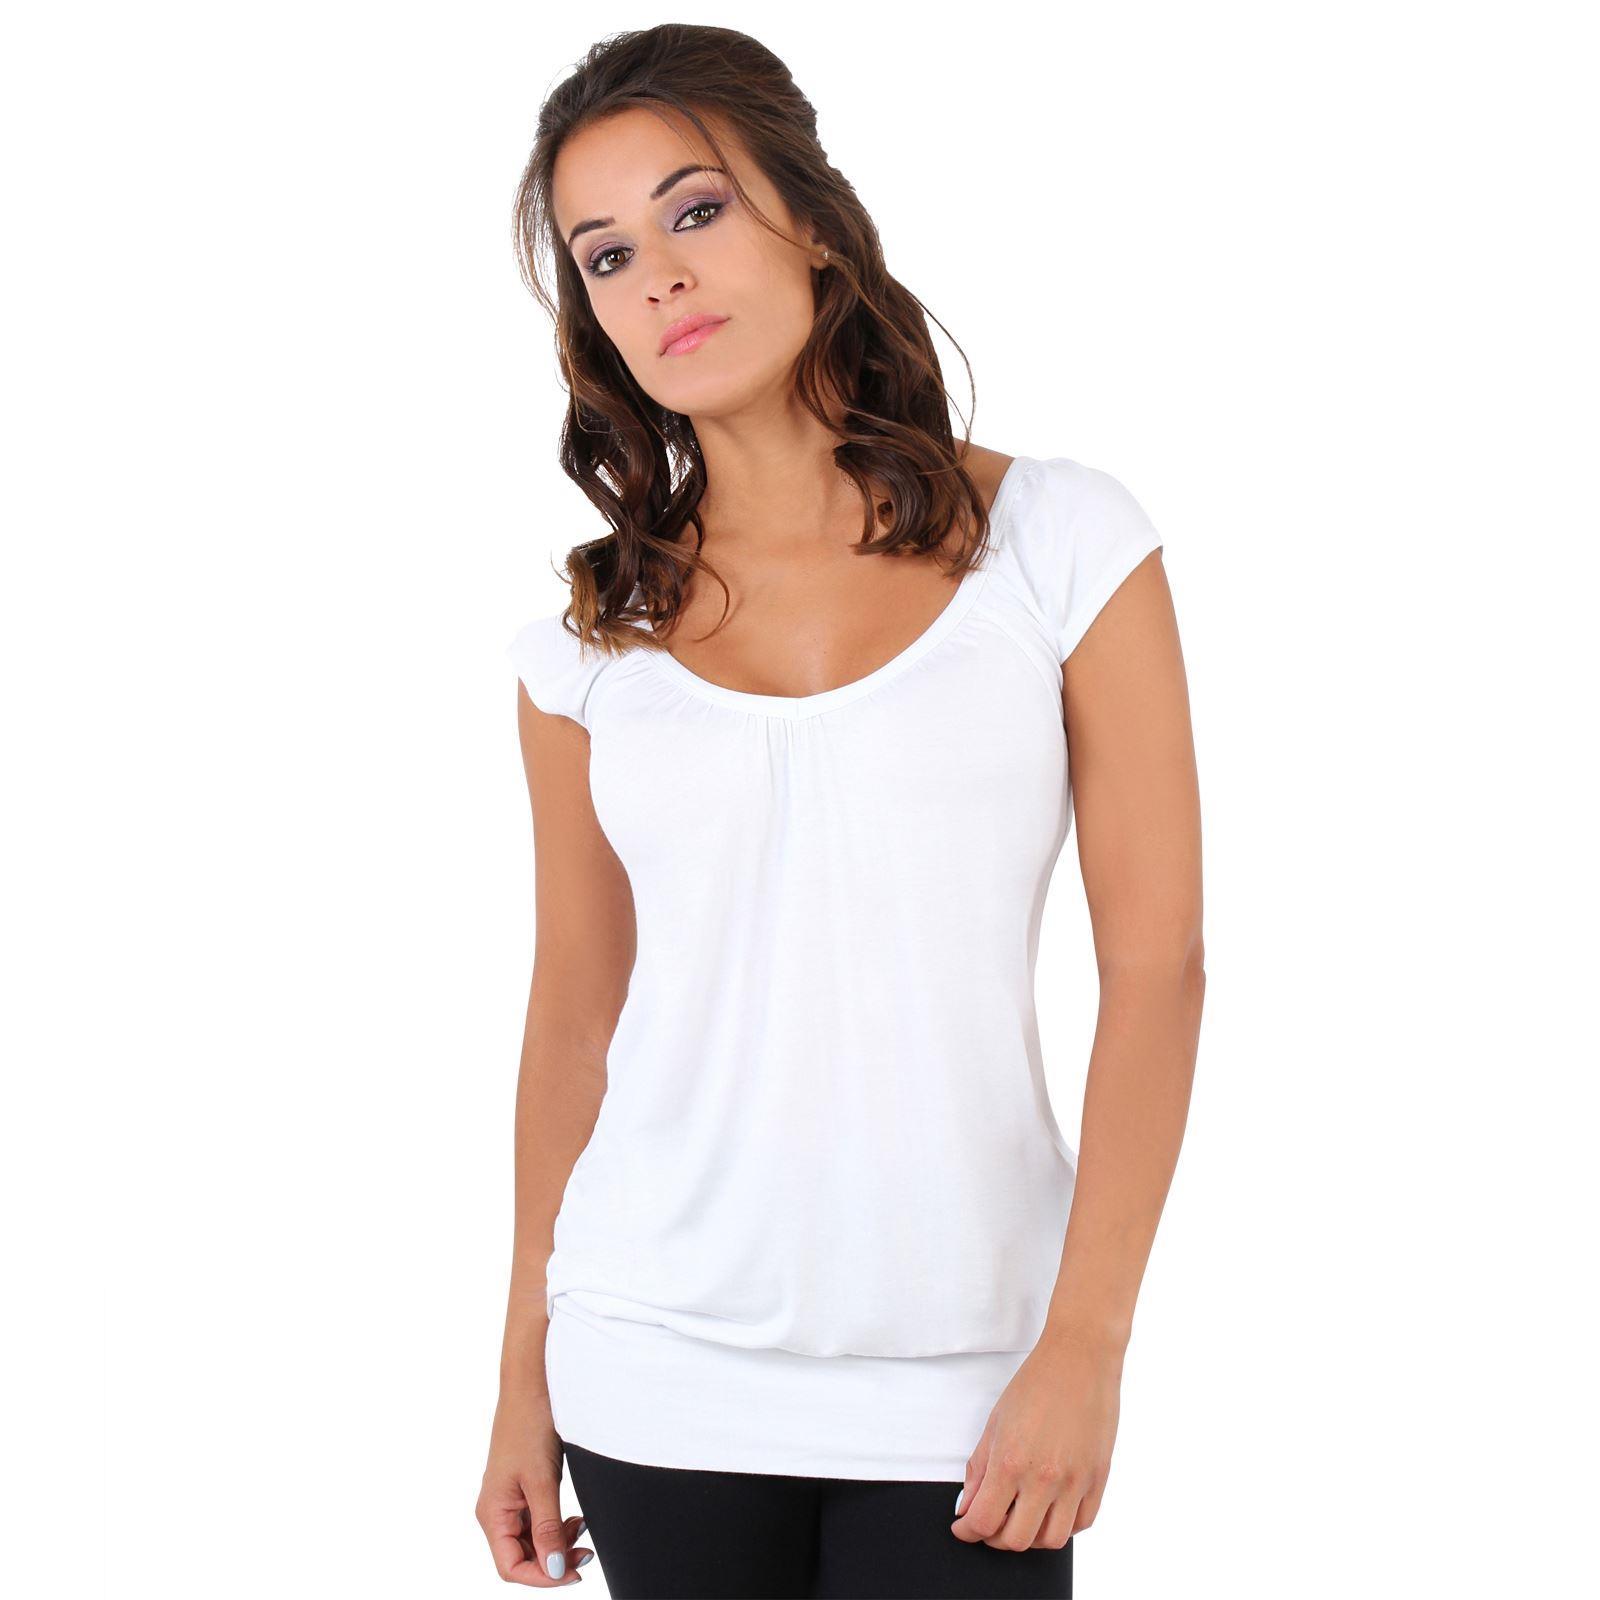 Womens-Ladies-Scoop-Neck-Blouse-V-T-Shirt-Long-Short-Sleeve-Plain-Loose-Top thumbnail 54